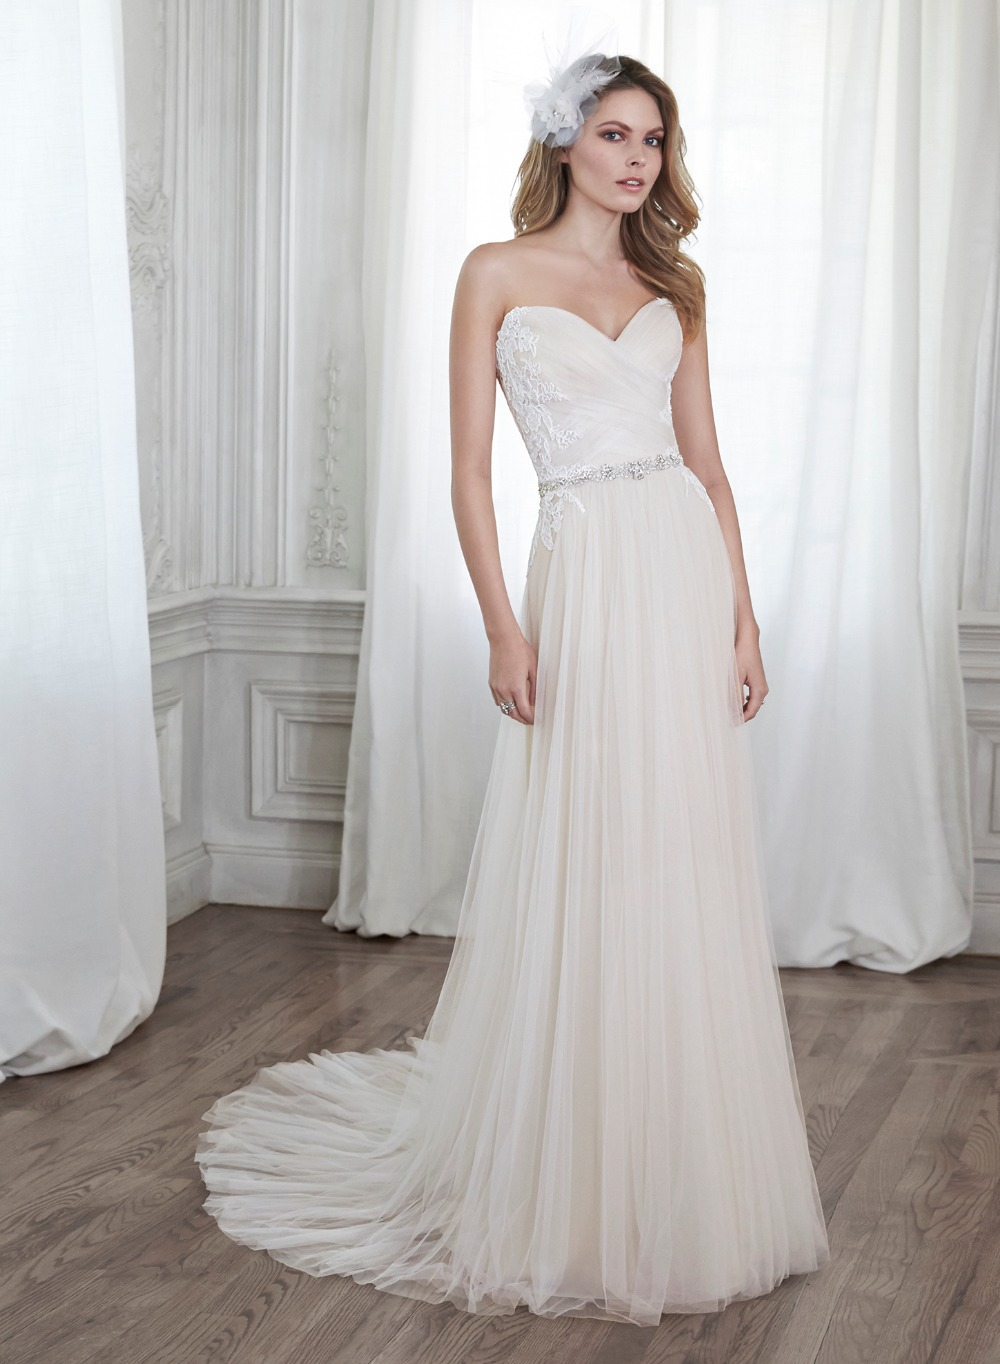 Being The Price!Good Quality!White Wedding Dress 2015 Vestido Sweetheart Led Beads Decoration Vestido(China (Mainland))